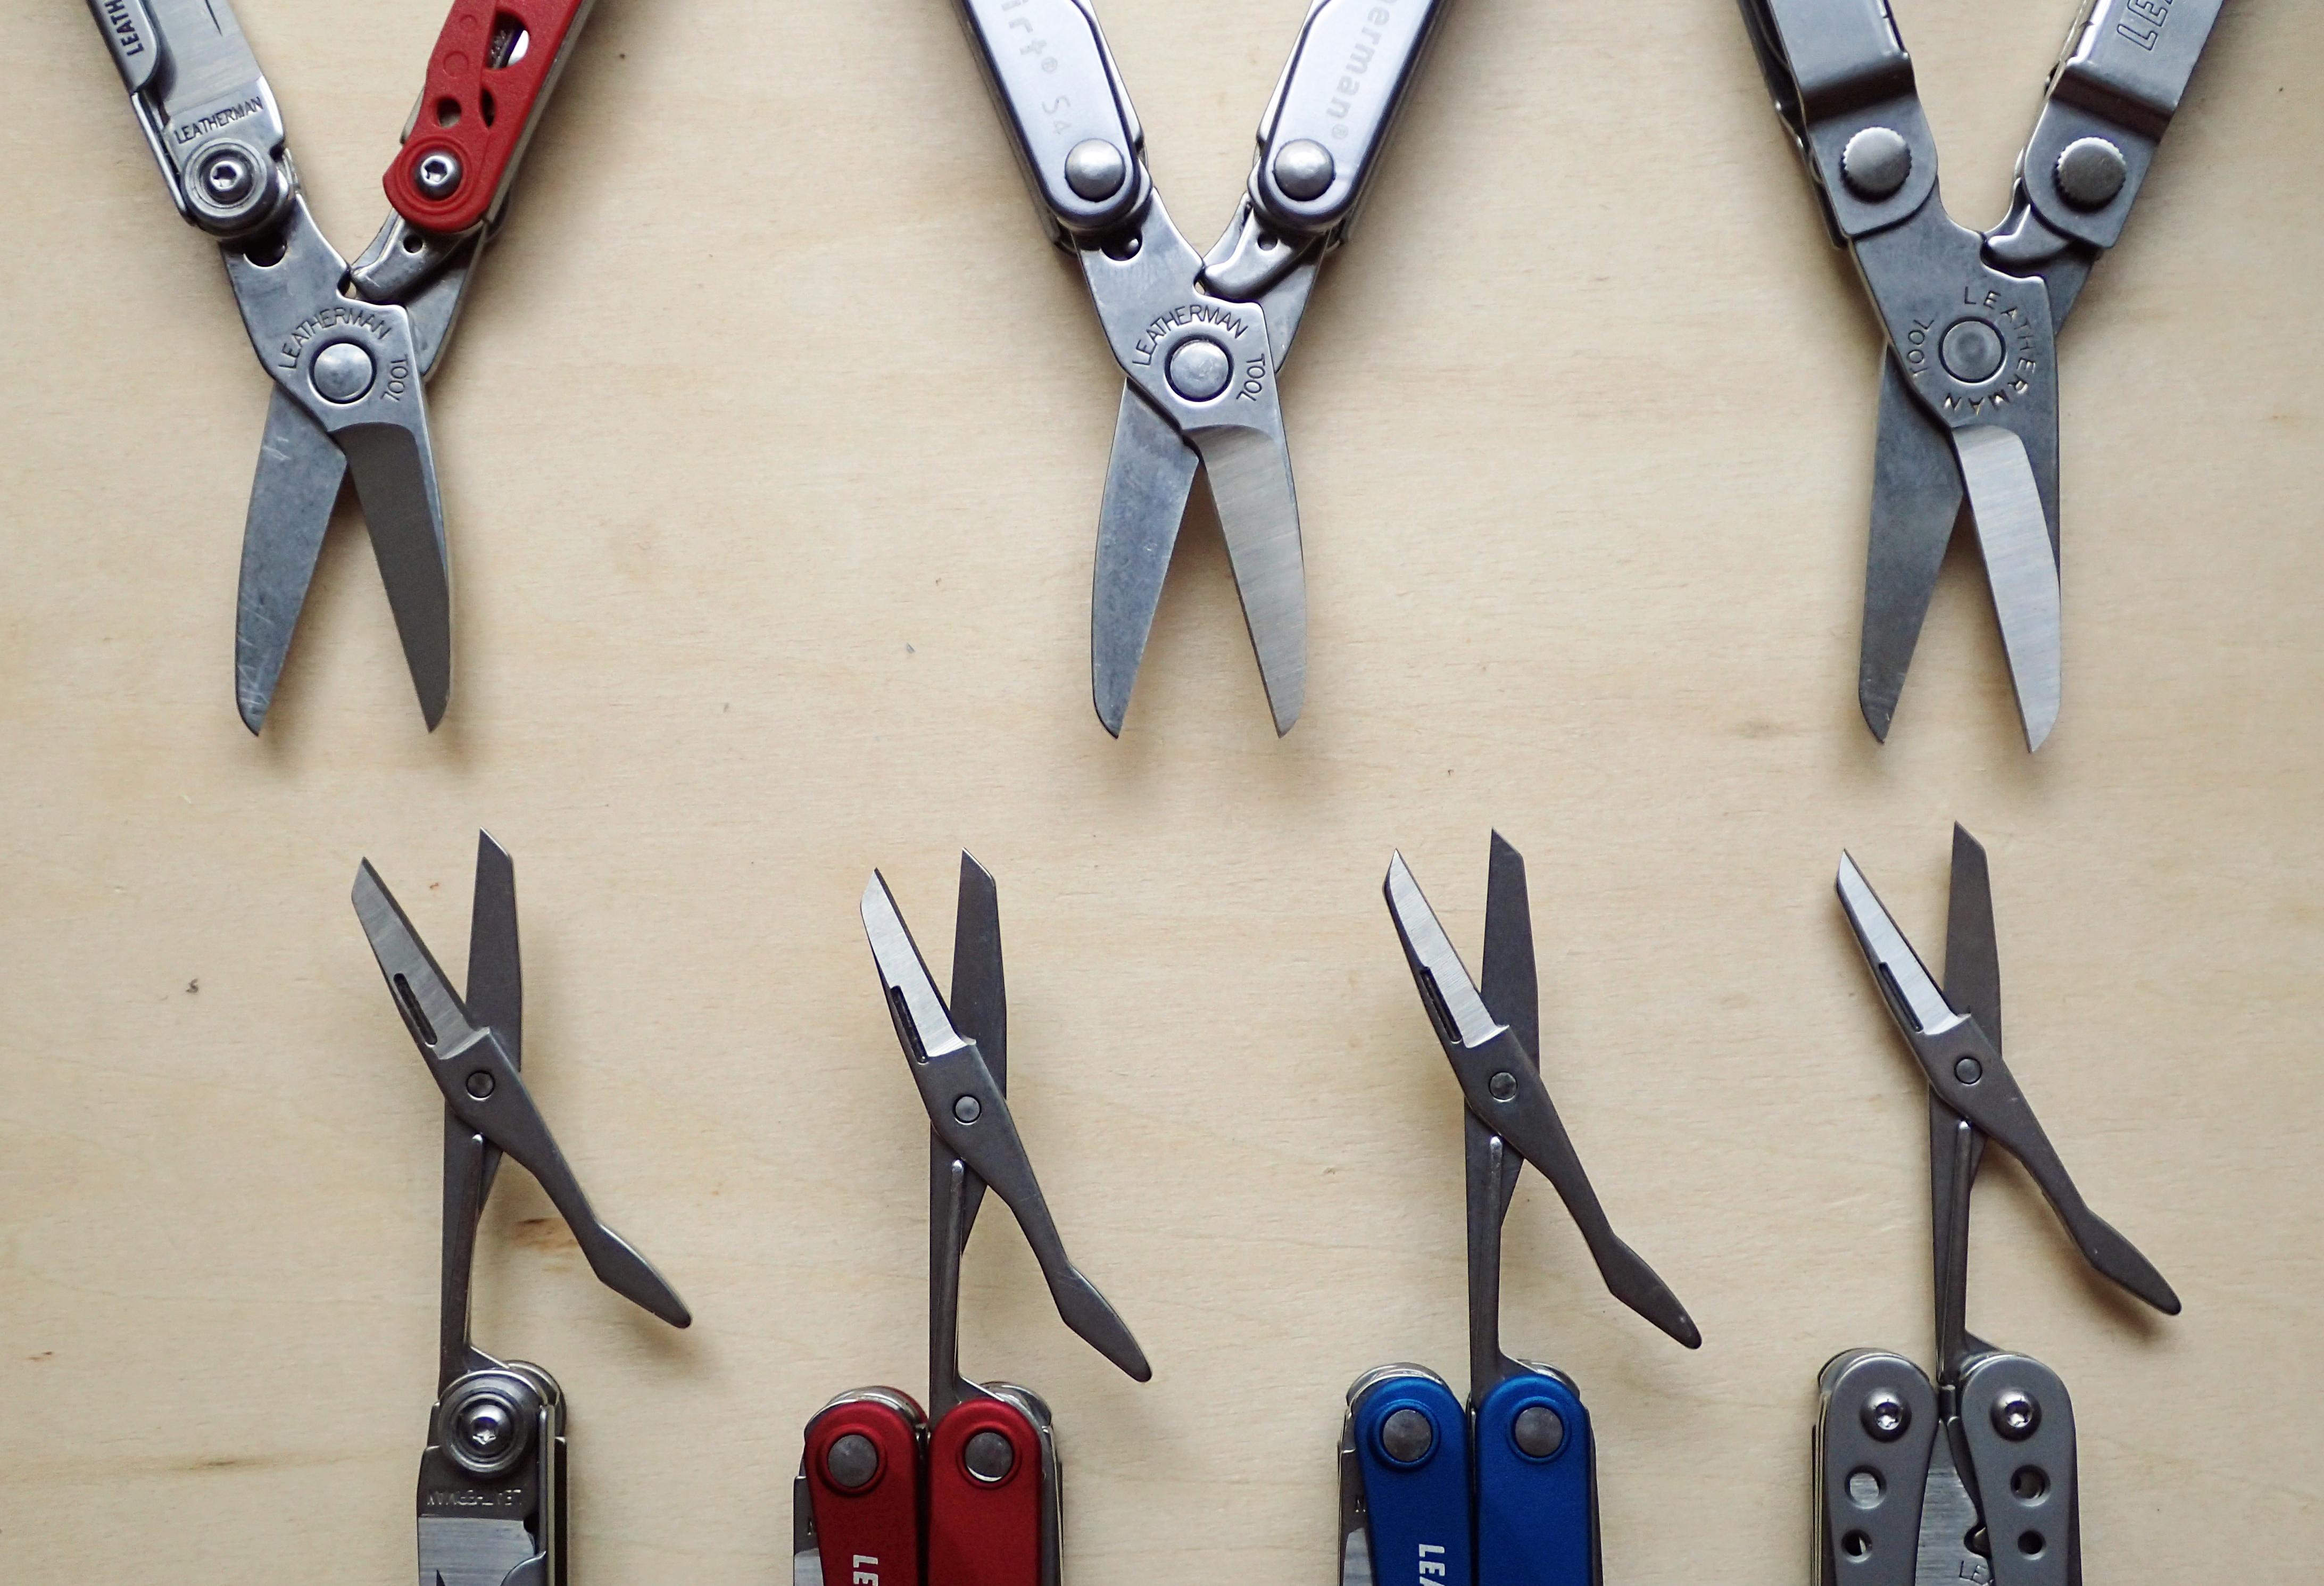 Leatherman scissors compared. Top row: Leatherman Style CS, Squirt S4, Micra. Bottom row: Leatherman Style, Squirt ES4, Squirt PS4, Style PS